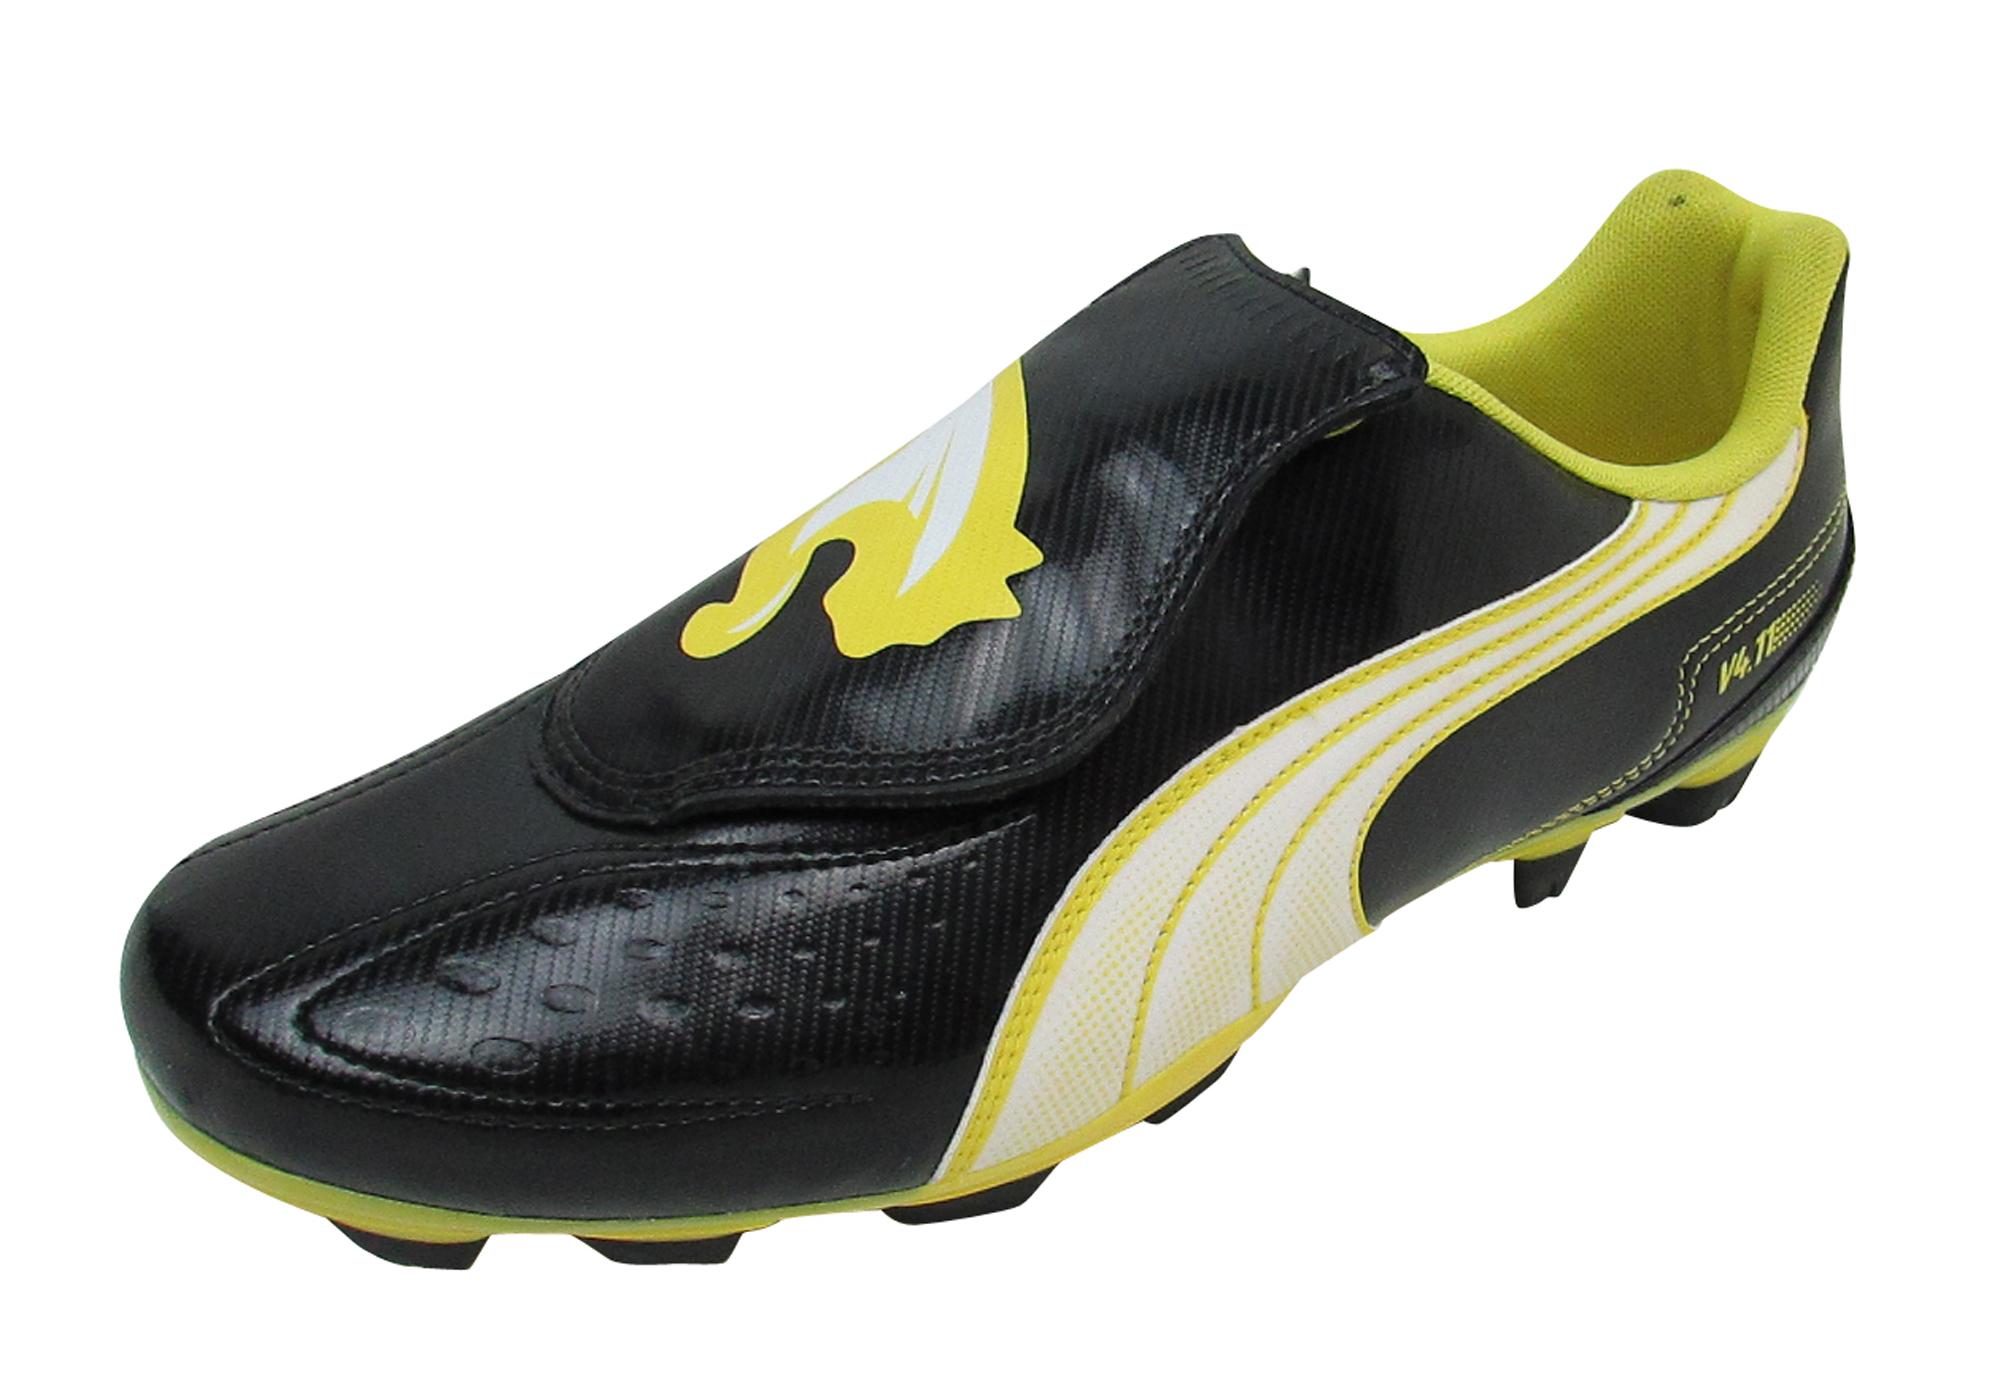 Details zu Mens Puma V4 11 i FG Firm Ground Football Boots Soccer Cleats Boot Size UK 6 12